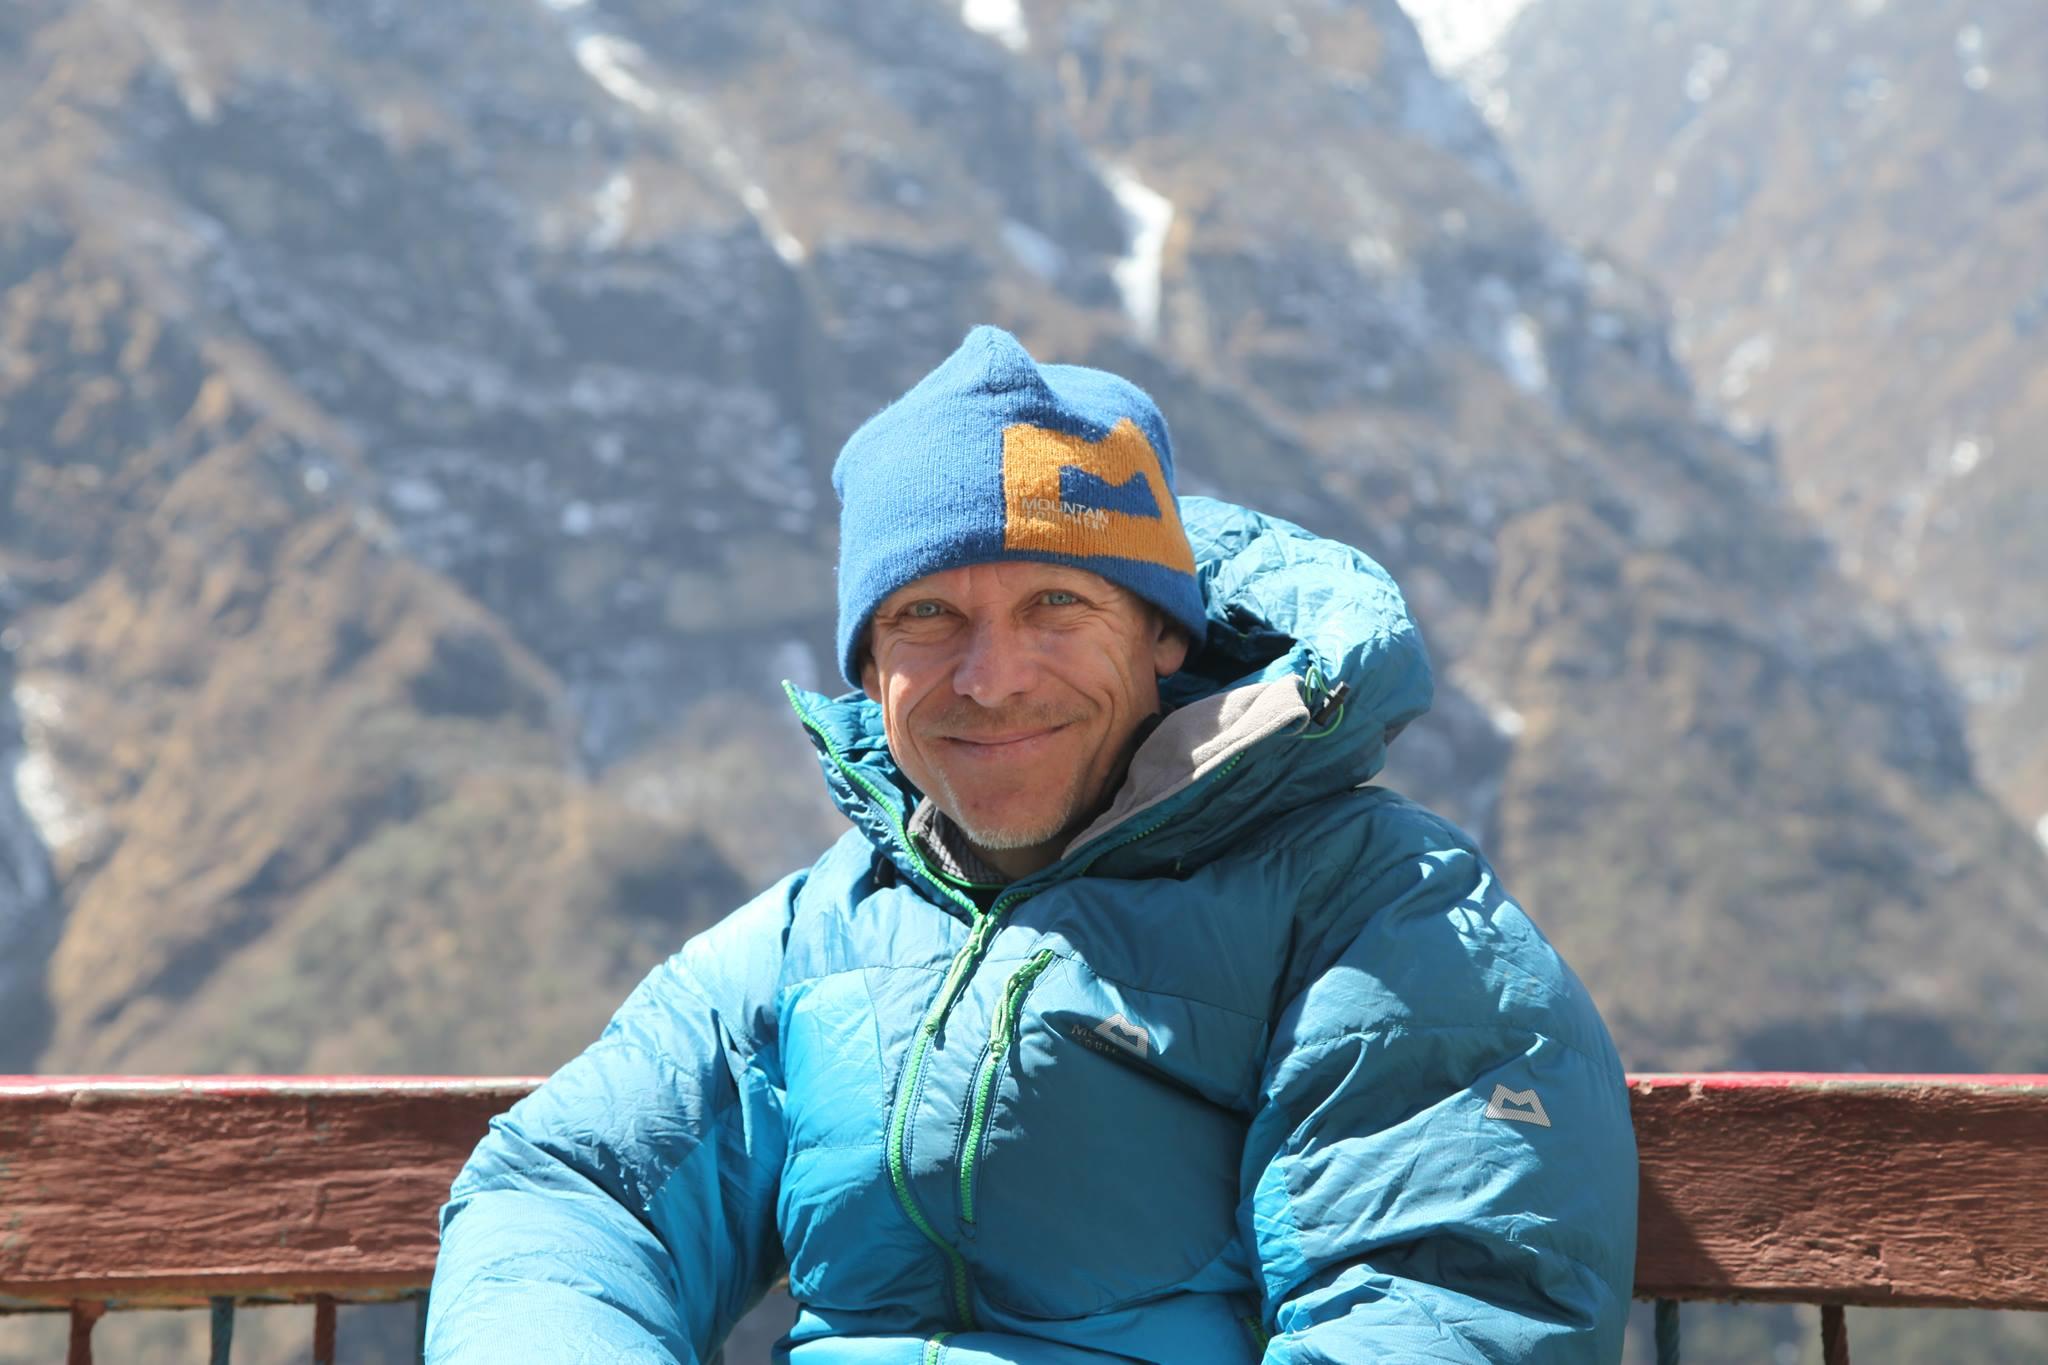 Expresky z hôr 92 - Peter Hámor, zdroj: FB page @himalayadventures